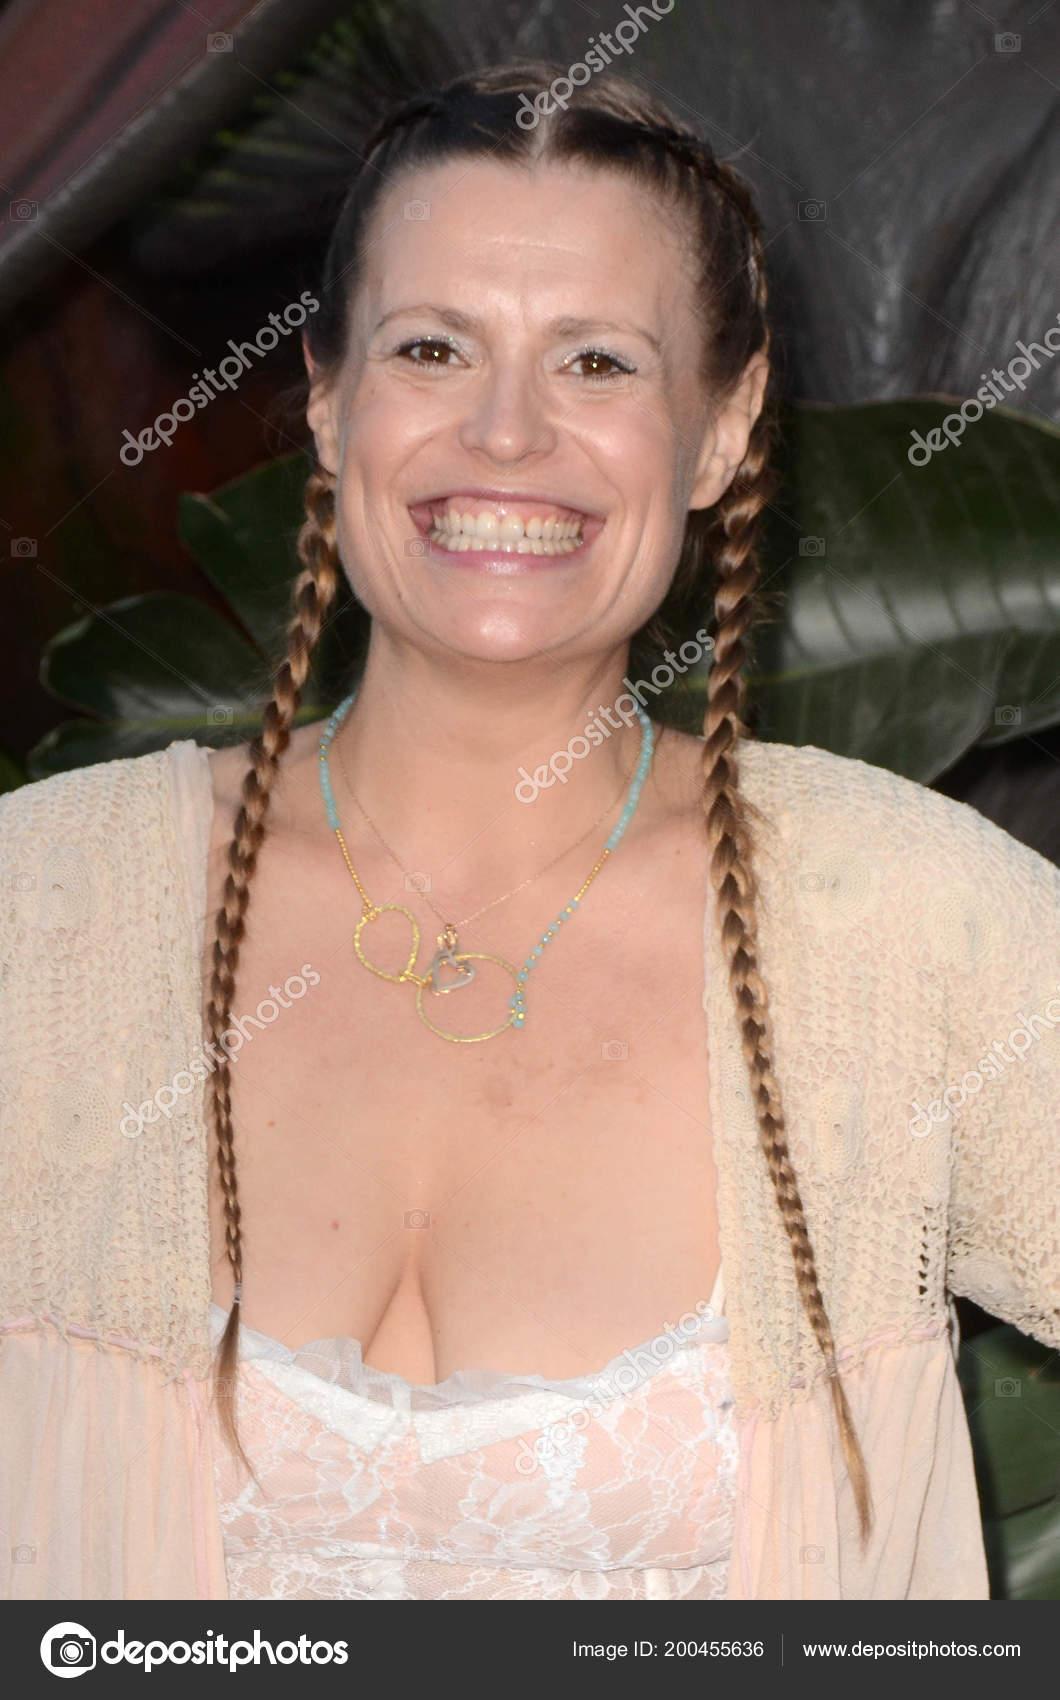 Emmanuelle Vera (b. 1994),Gail O'Grady born January 23, 1963 (age 55) Hot fotos Libbi Gorr,Flora Newbigin